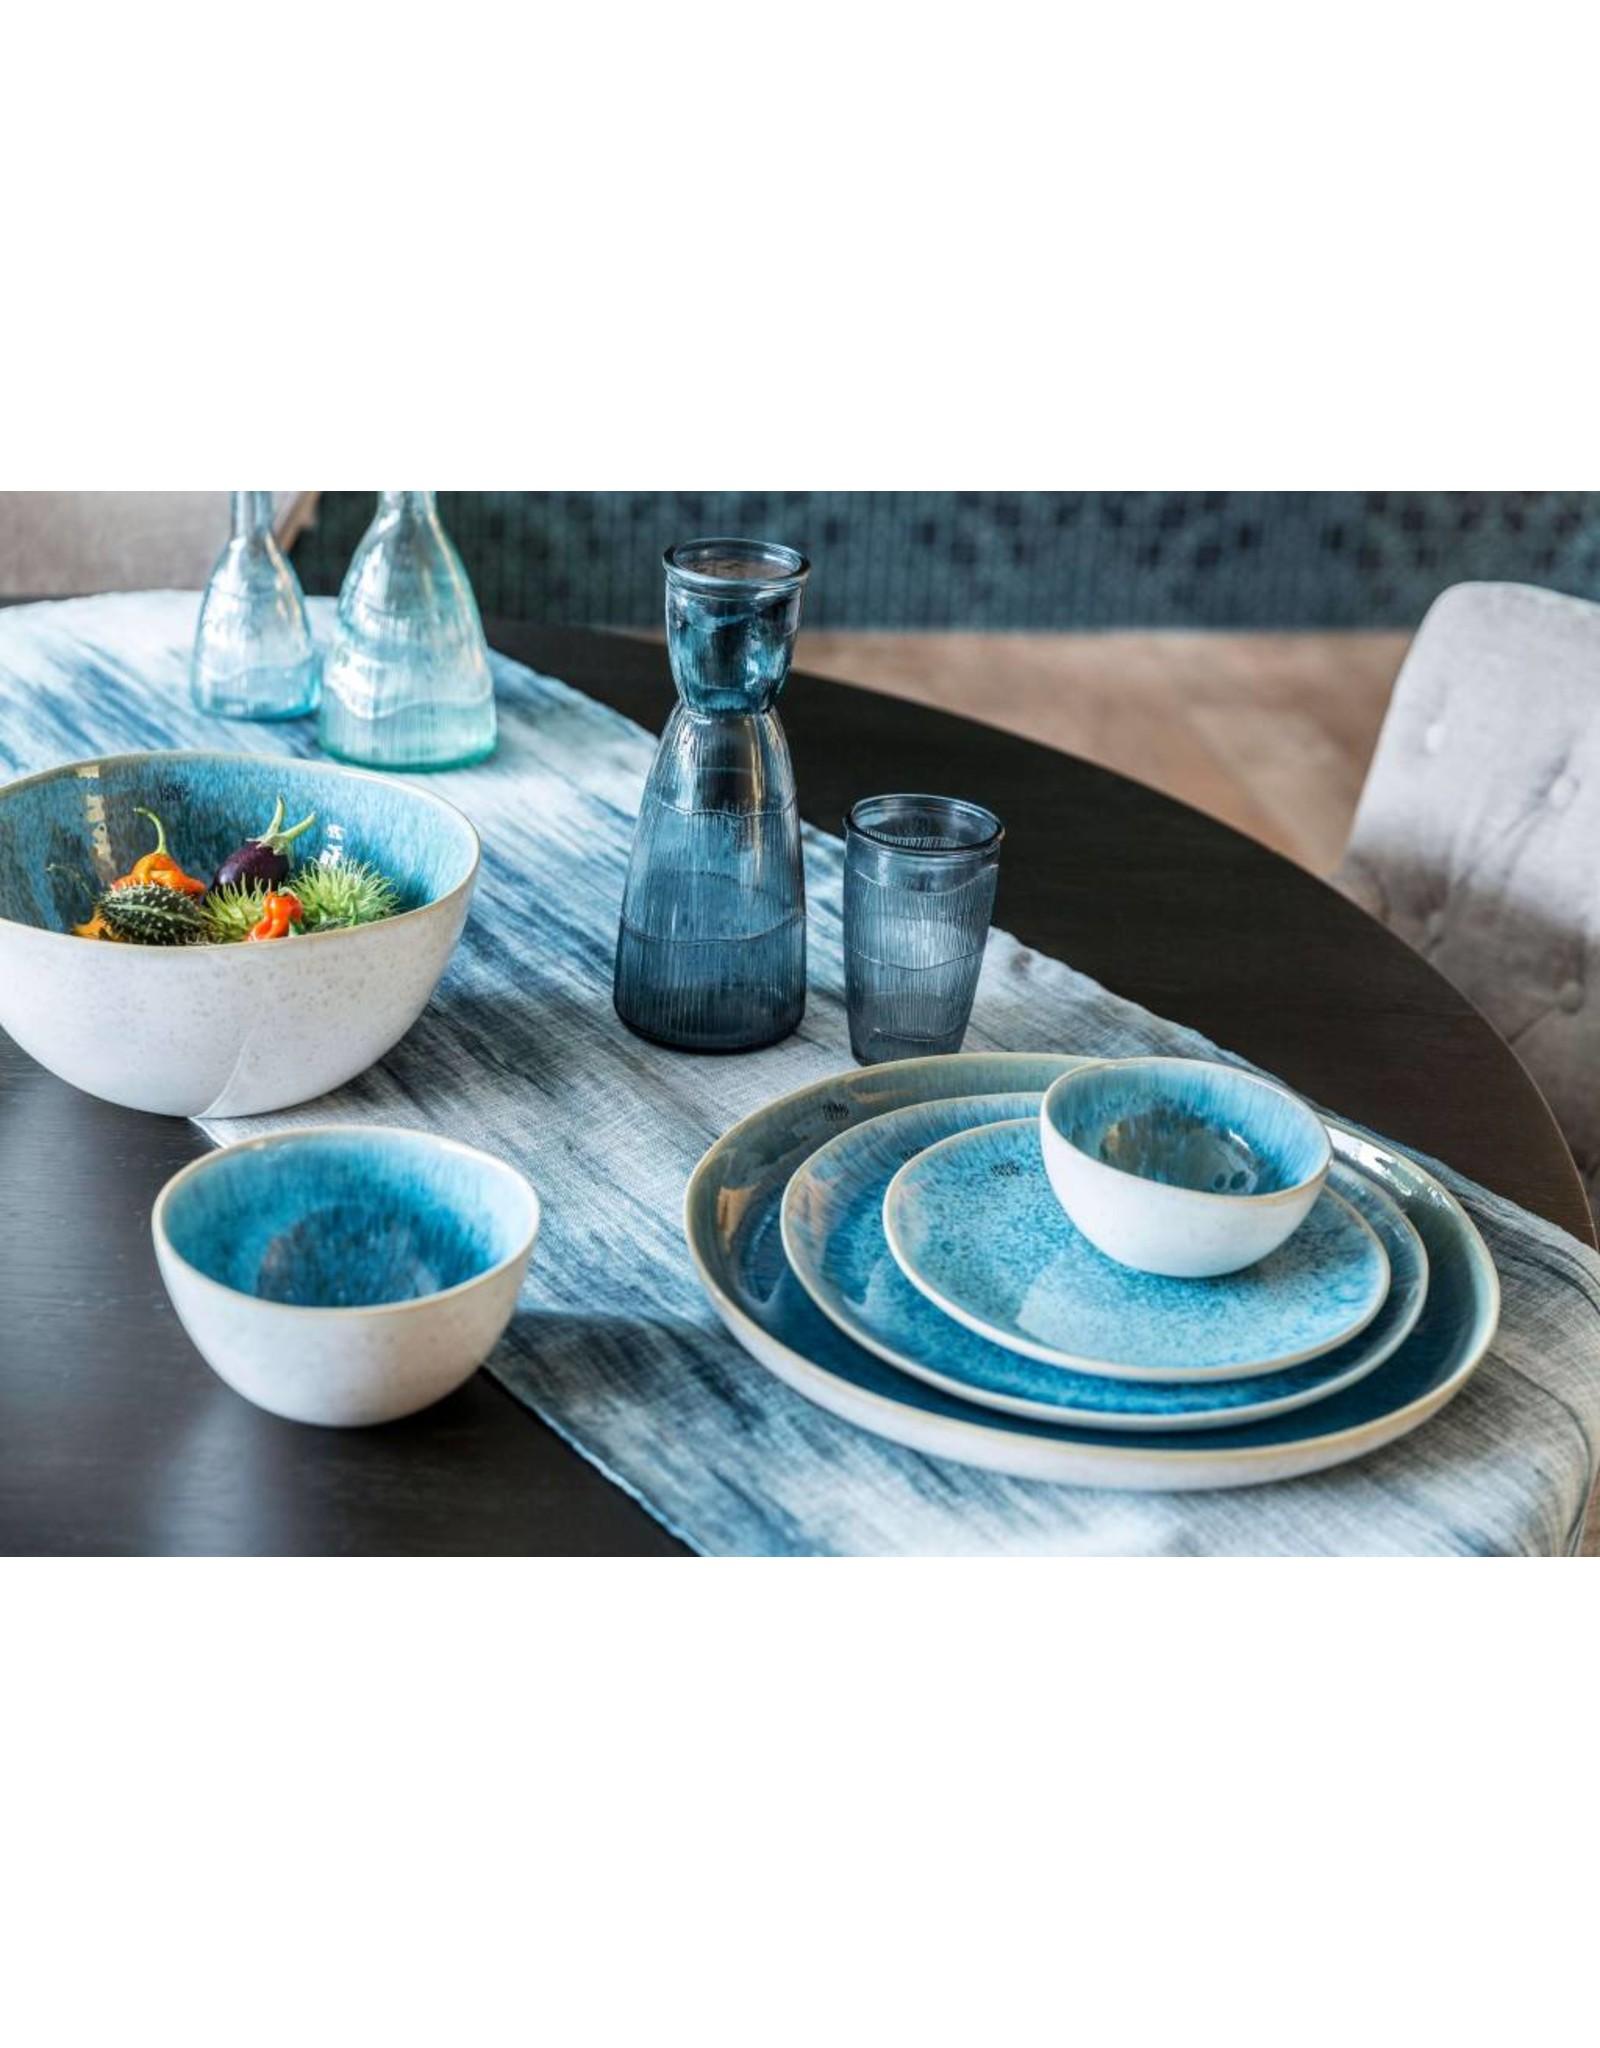 Dome Deco Kom soep of ontbijt turquoise